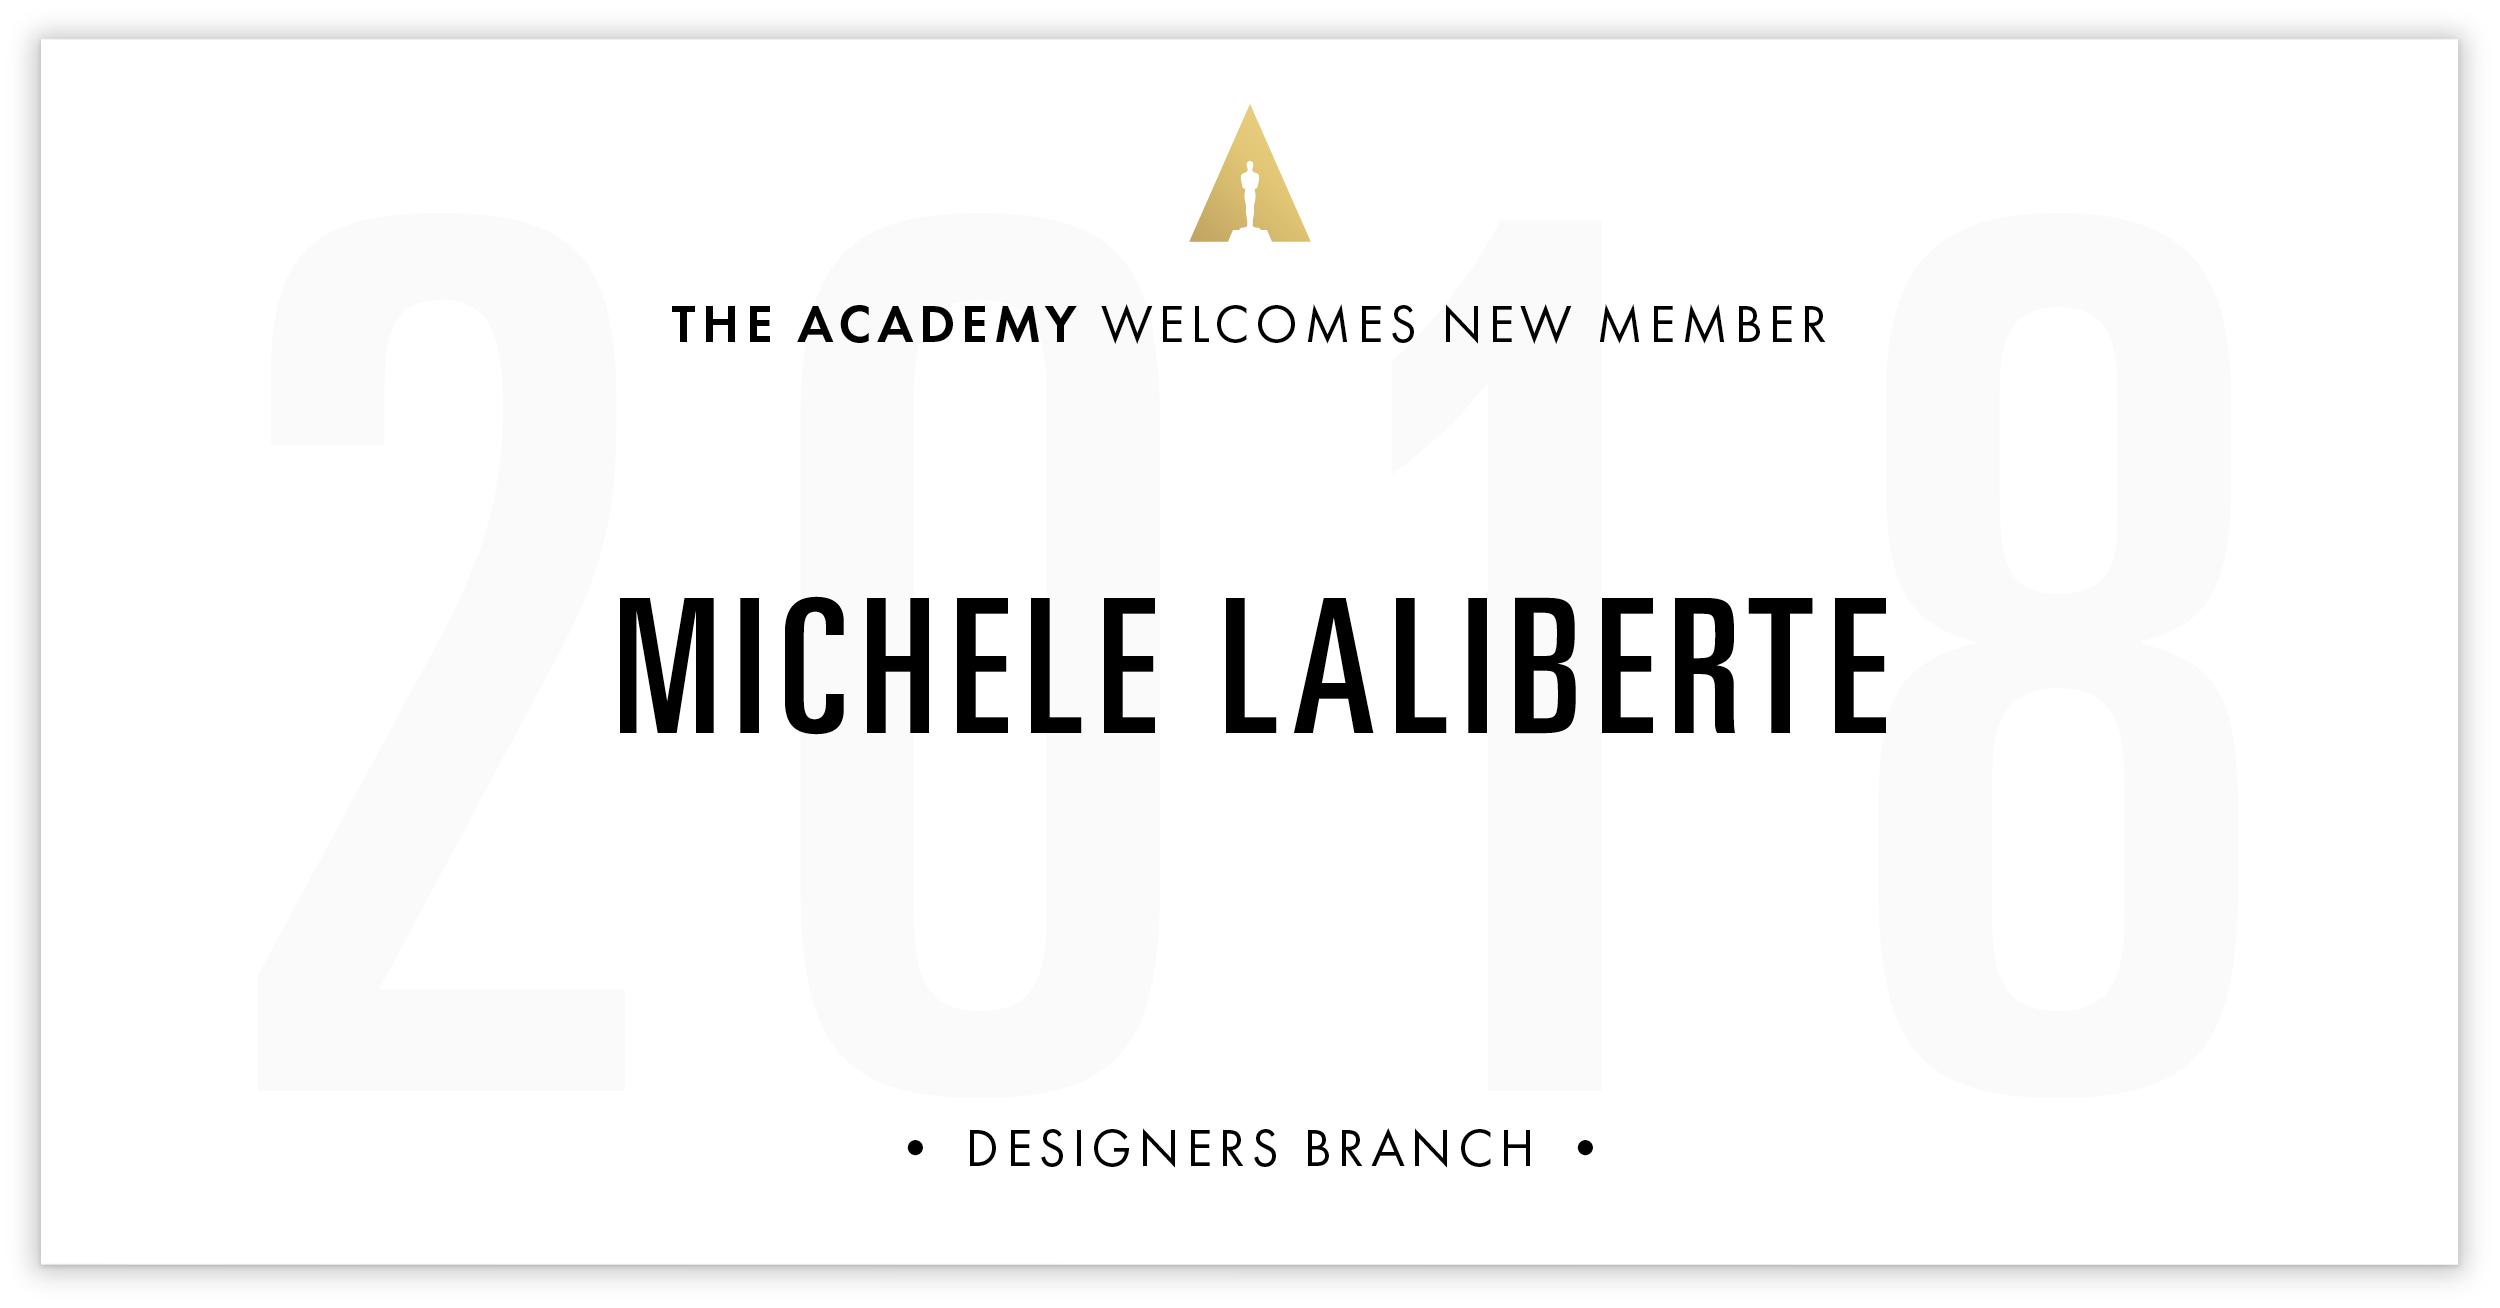 Michele Laliberte is invited!